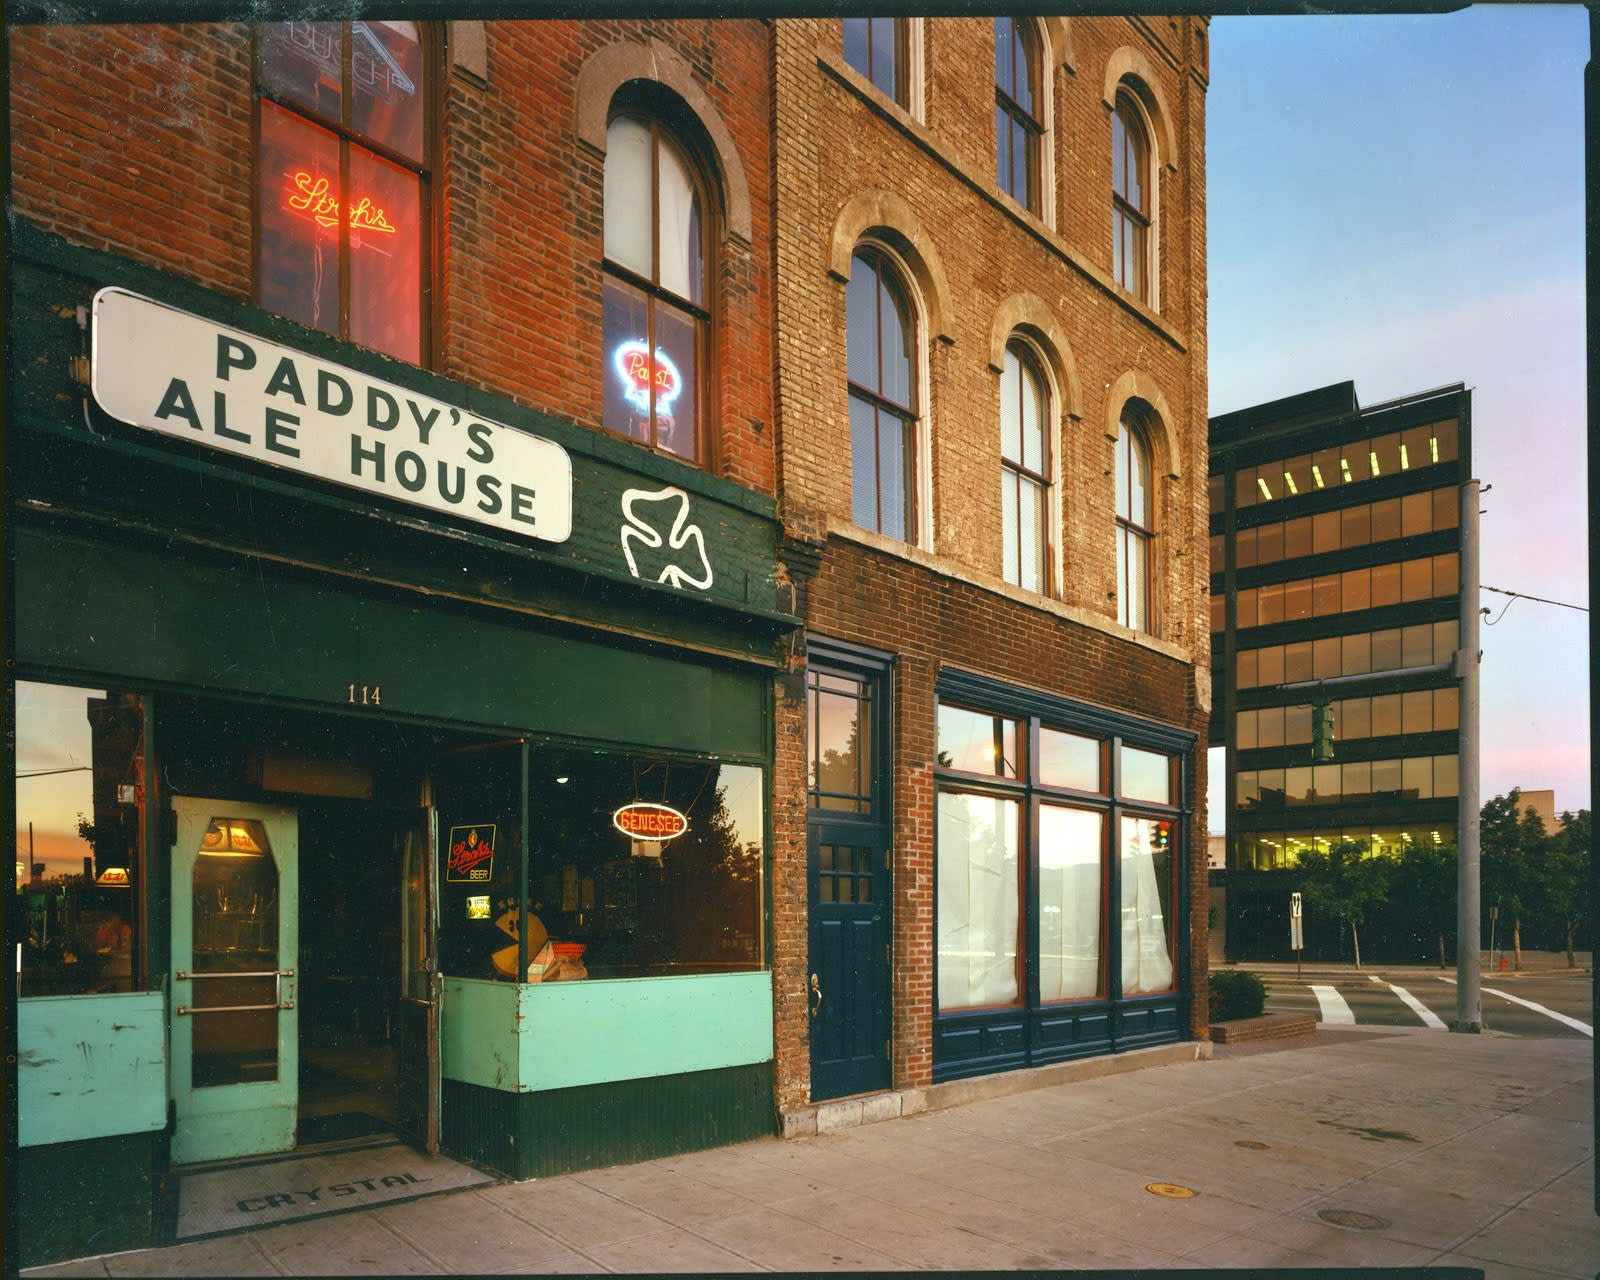 Bruce Wrighton, Paddy's Ale House